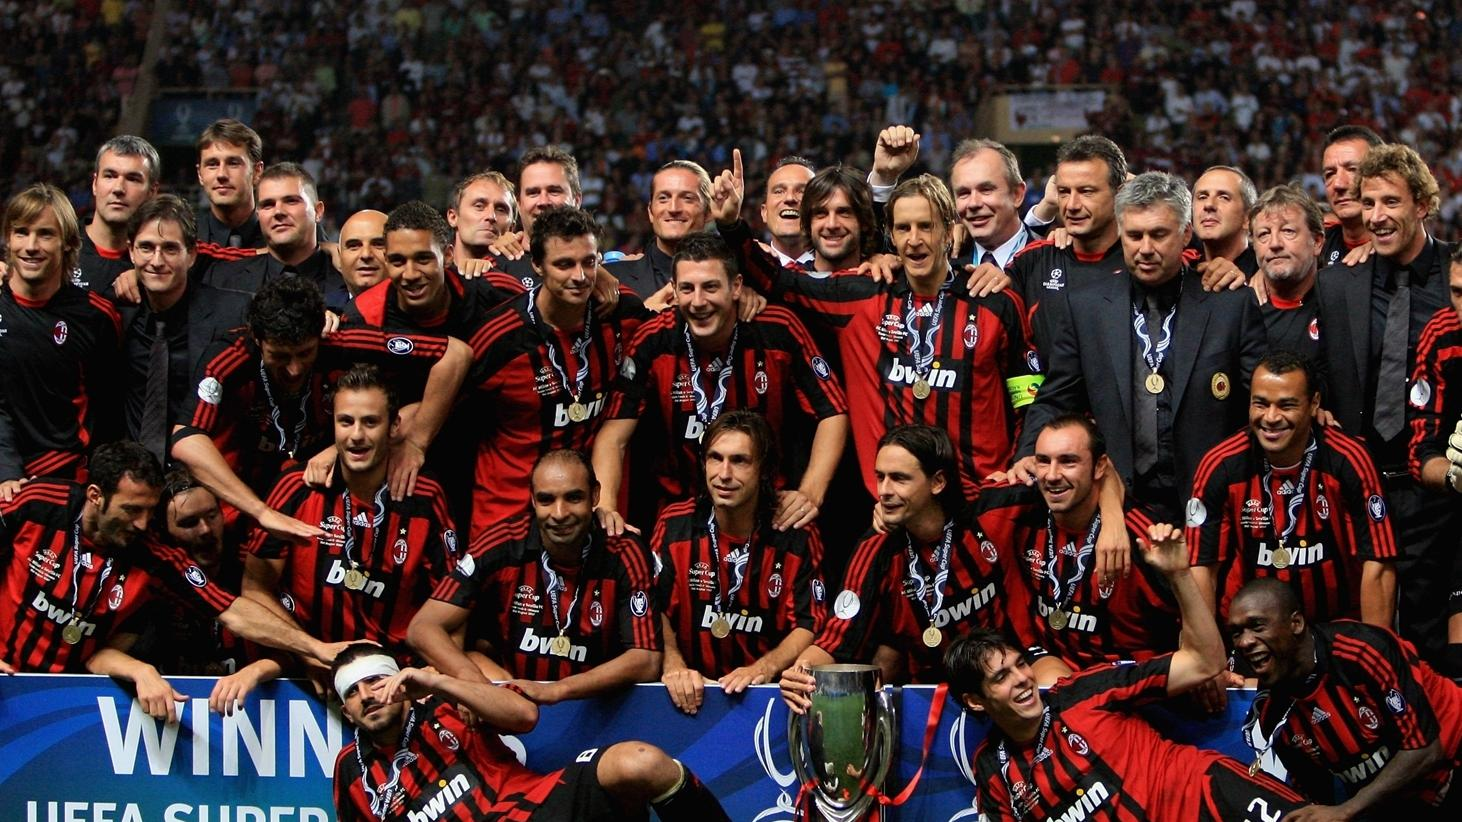 Uefa Super Cup 2007 Milan Overcome Sombre Sevilla